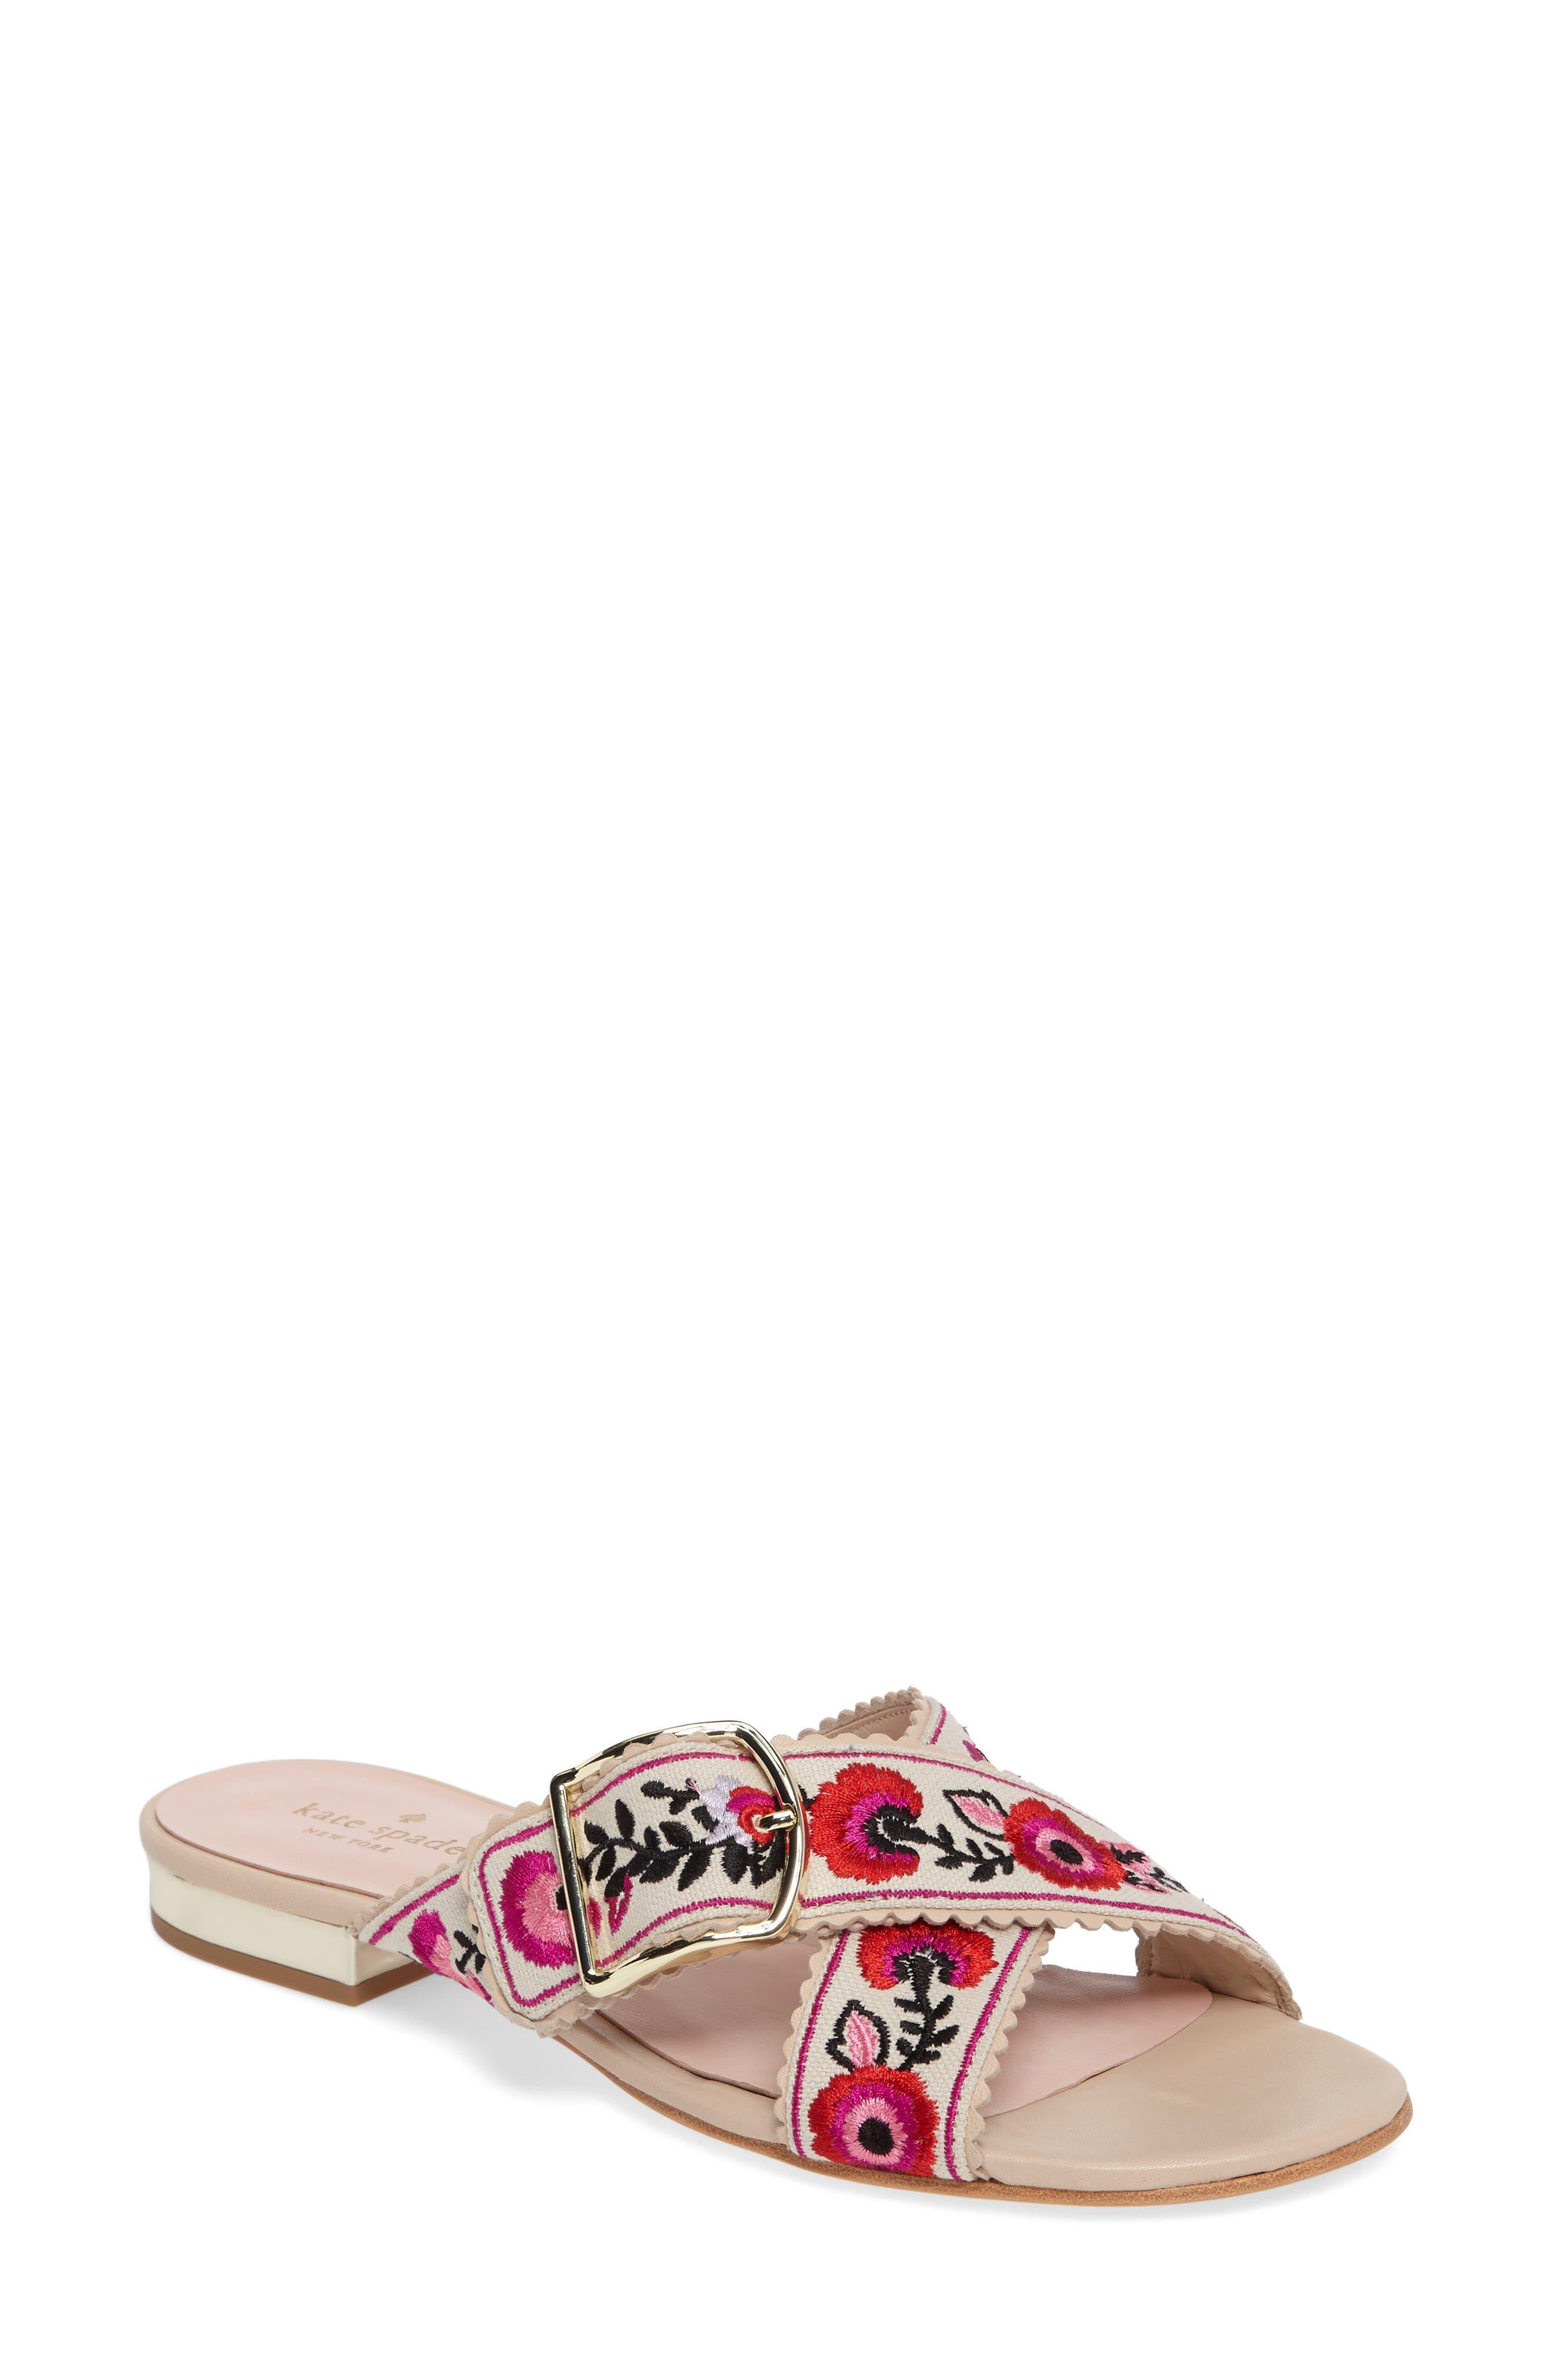 KATE SPADE NEW YORK faris sandal